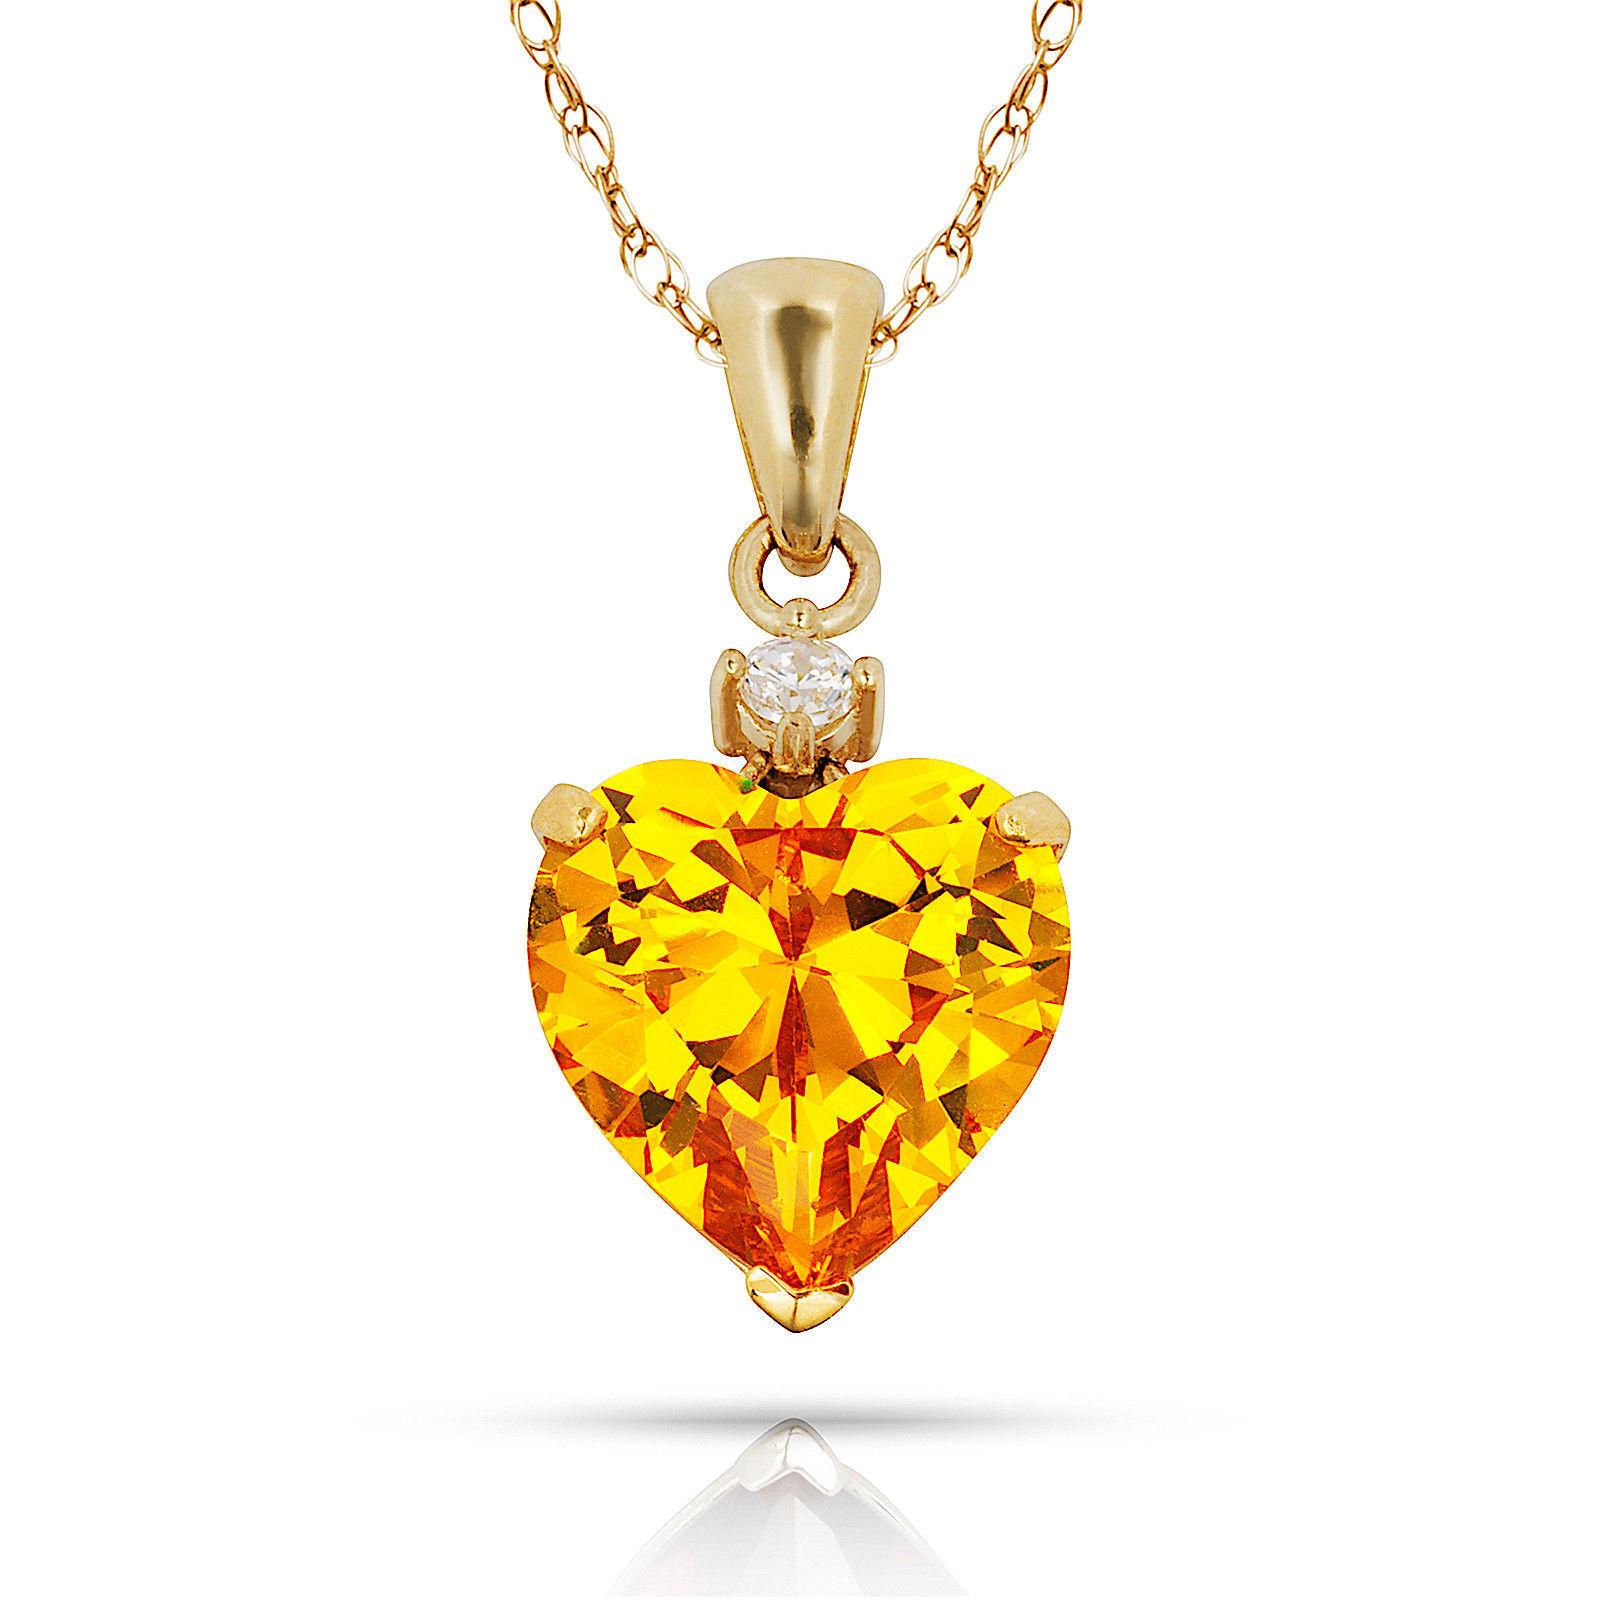 3.07Ct Created Diamond & Heart Citrine Charm Pendant14K Yellow Gold w/Chain